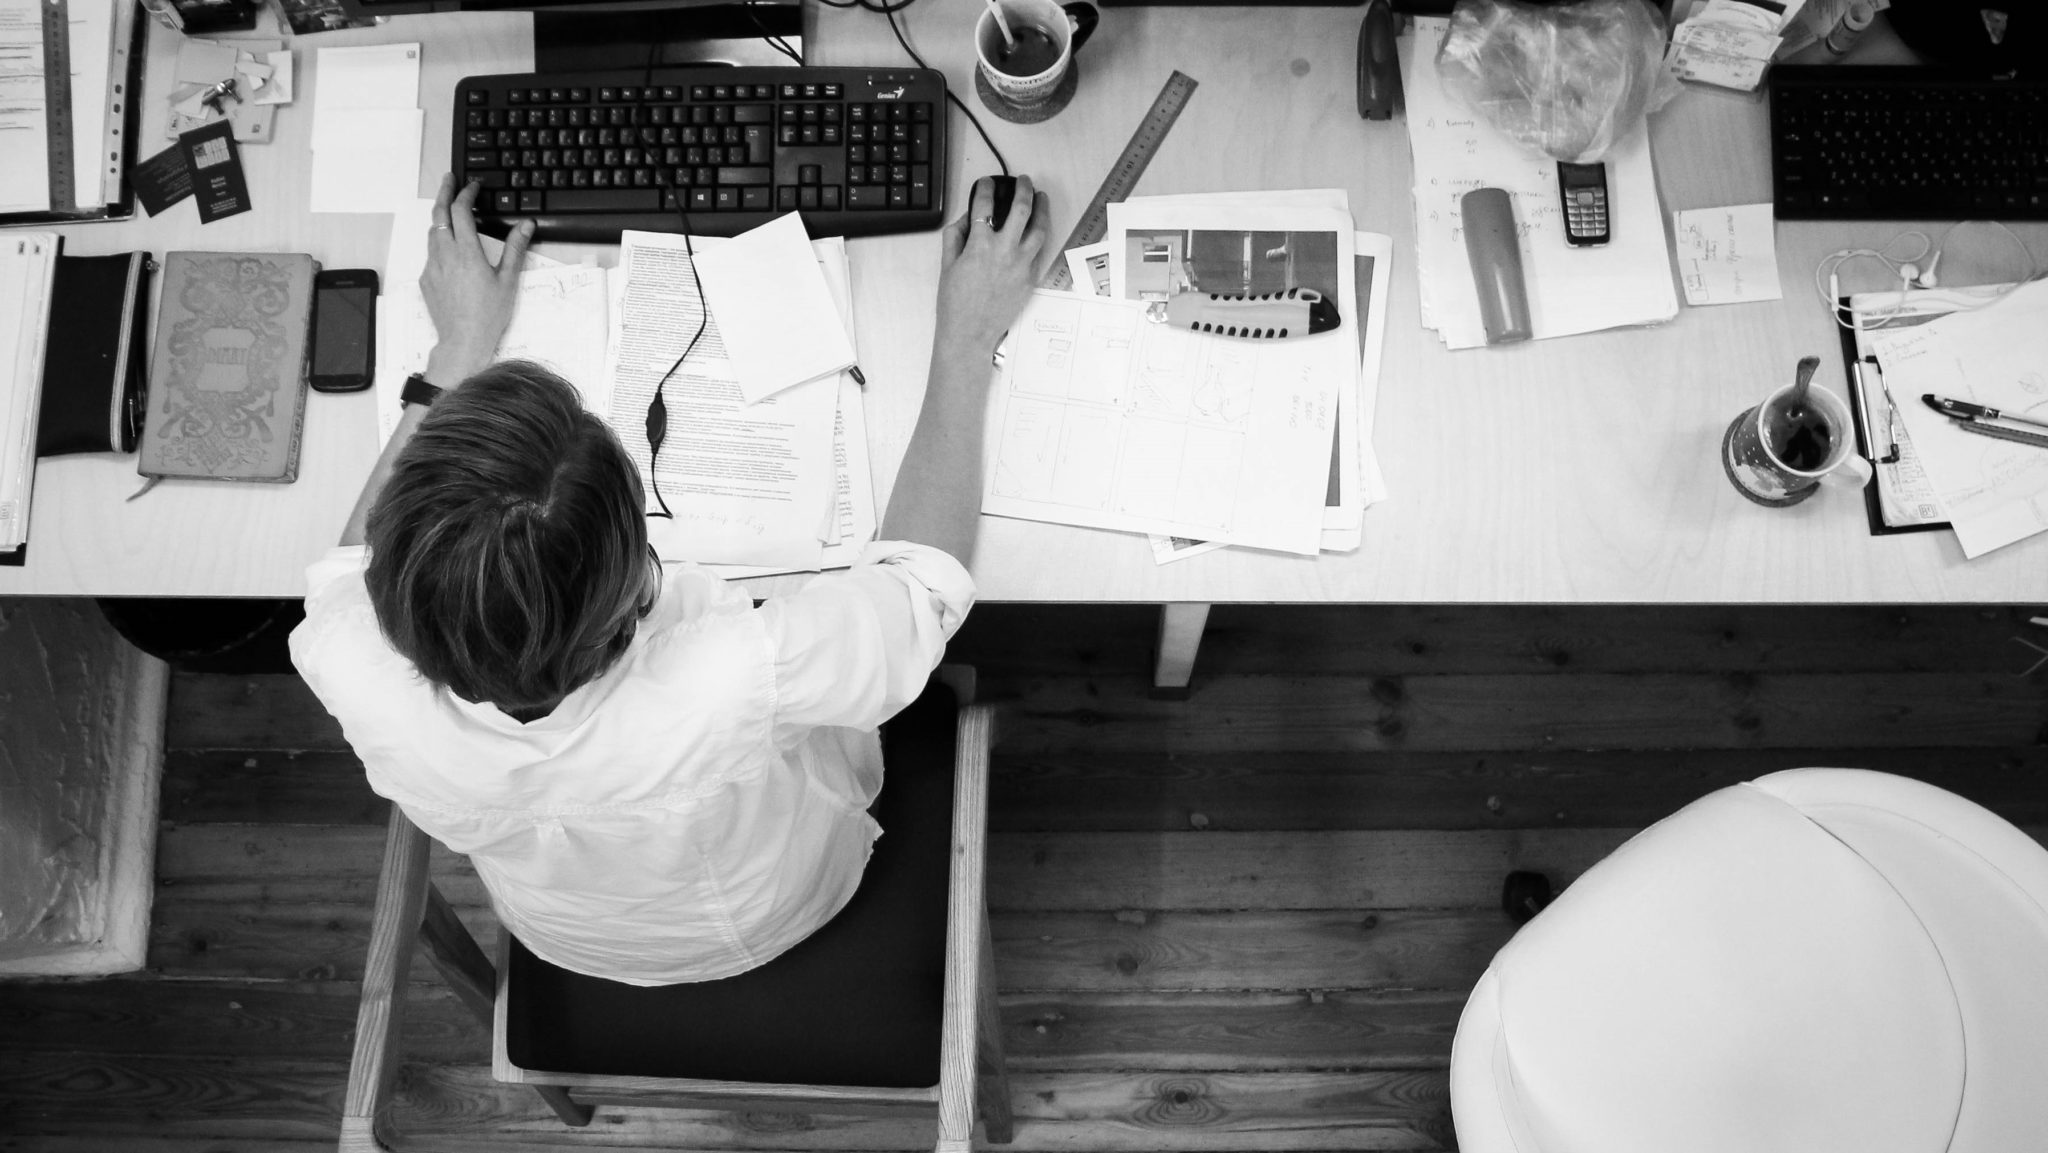 Employee Liability